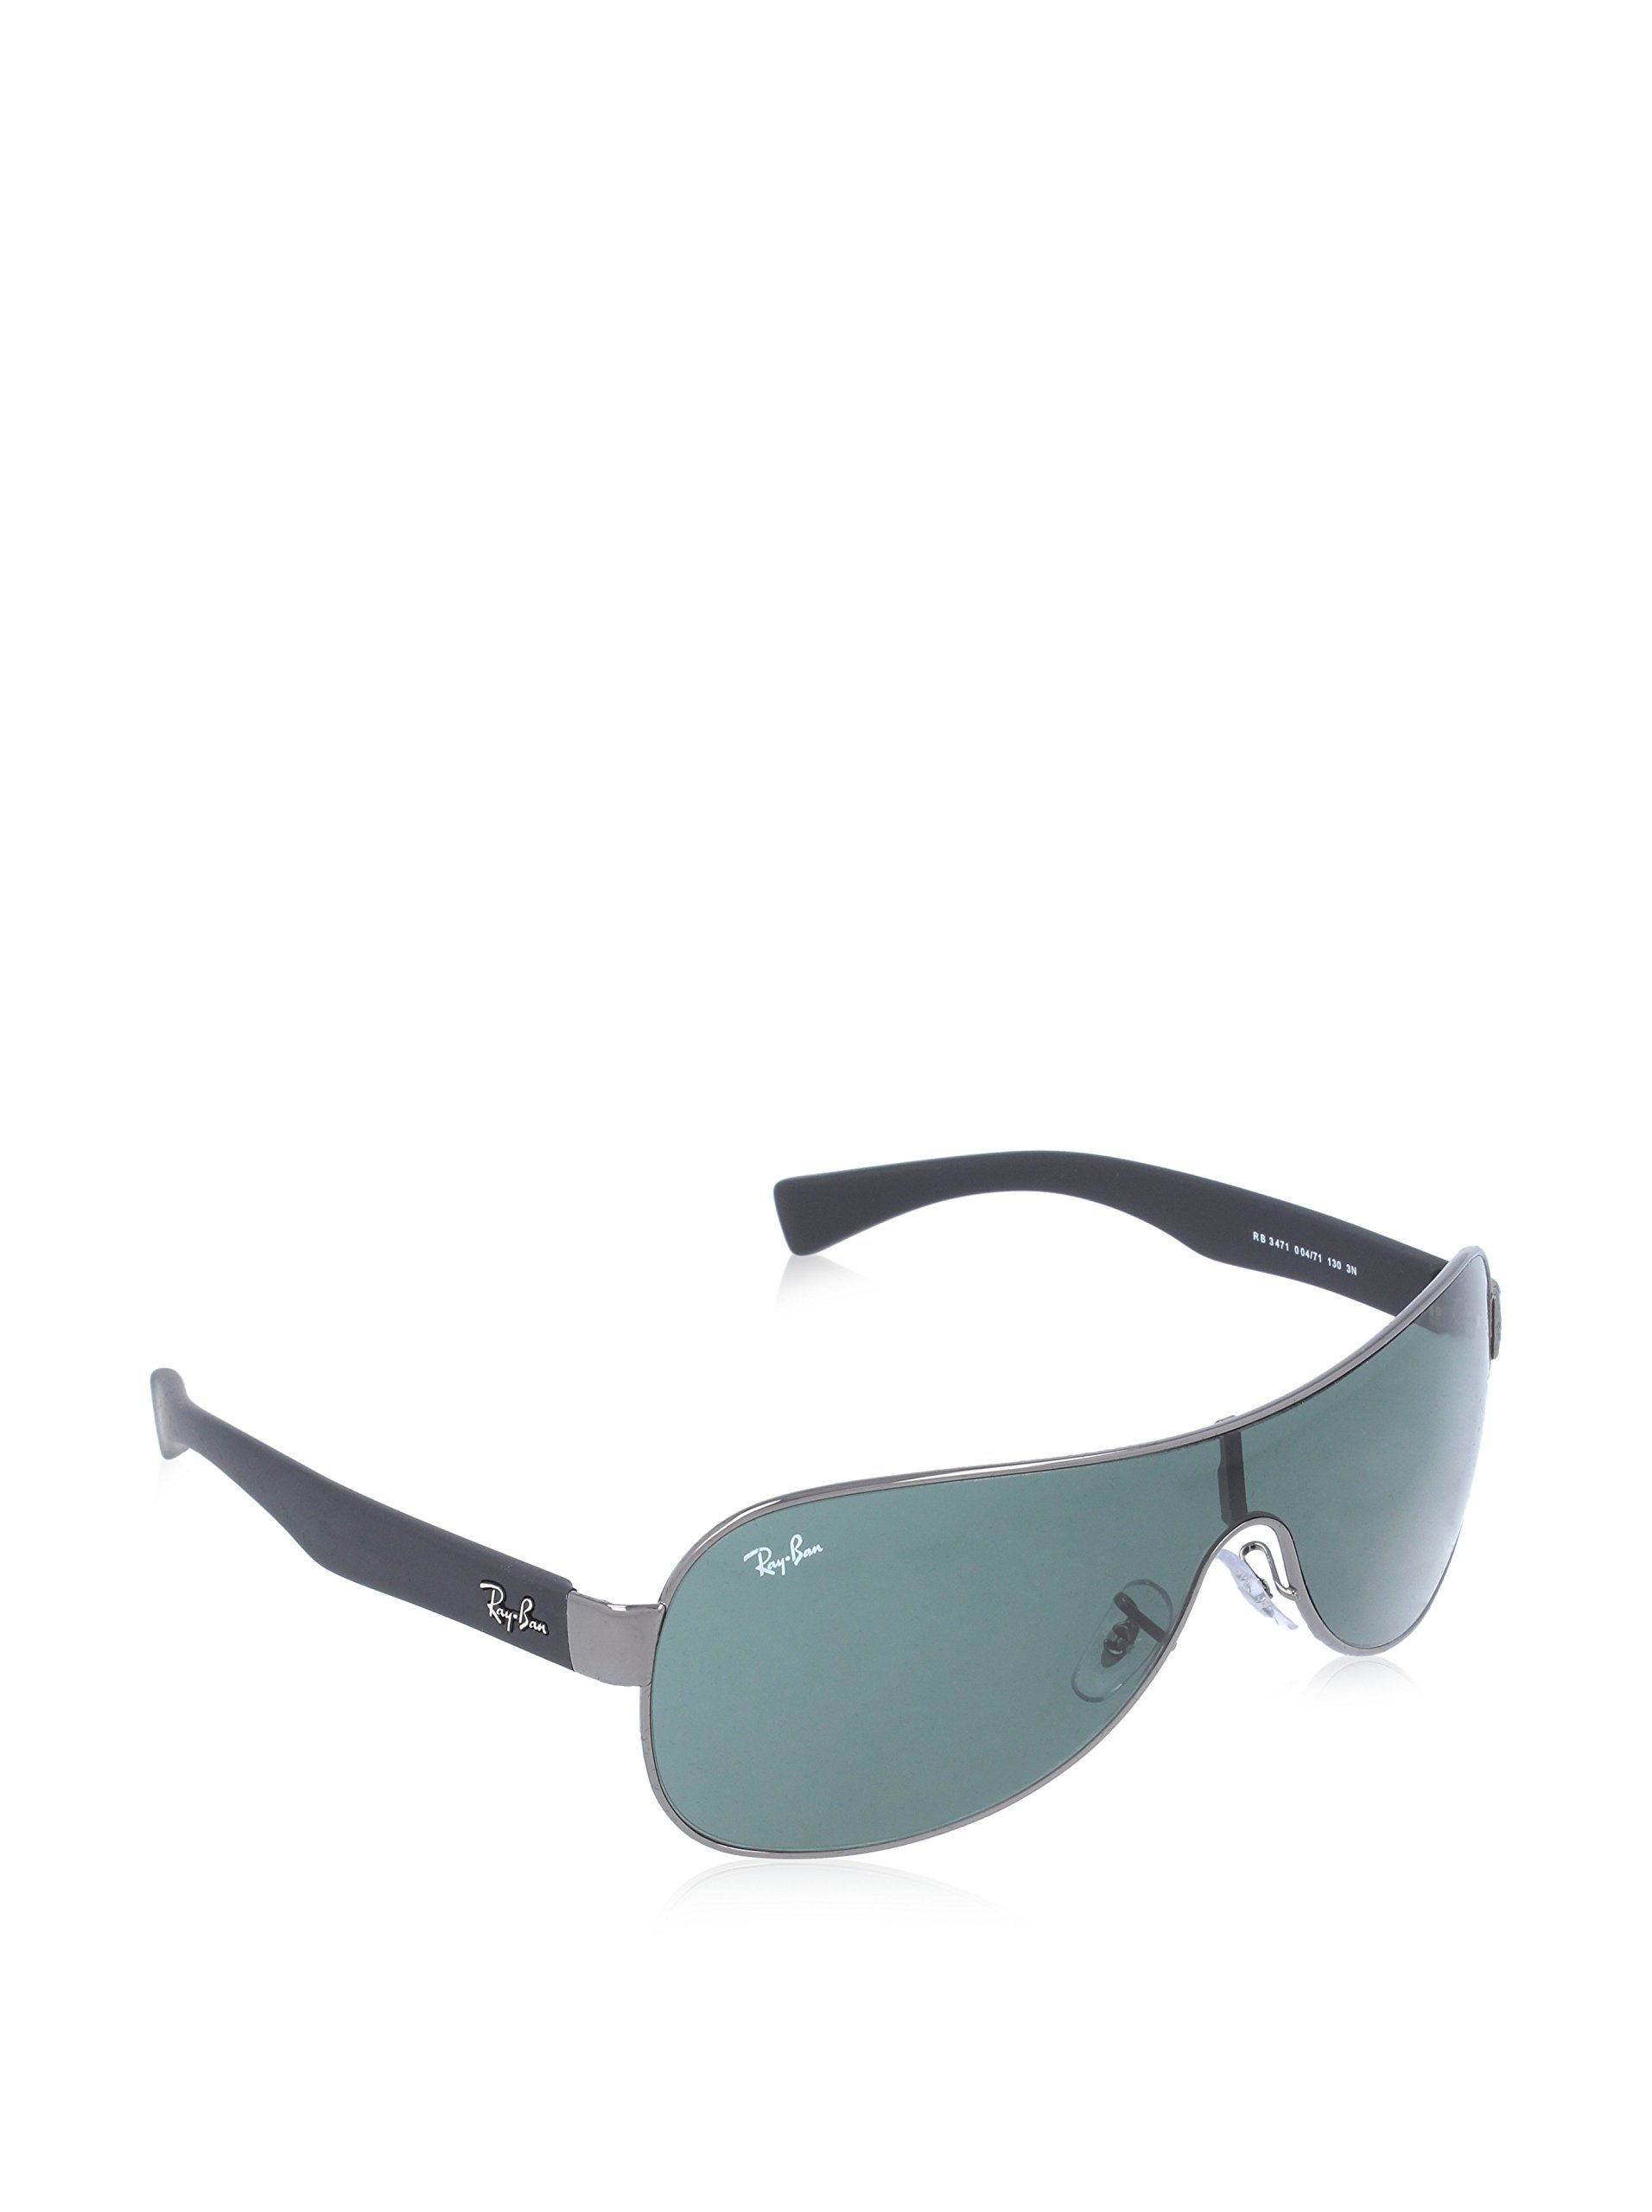 6b6ed79a5d1 Sunglasses For Large Heads Uk - Restaurant and Palinka Bar